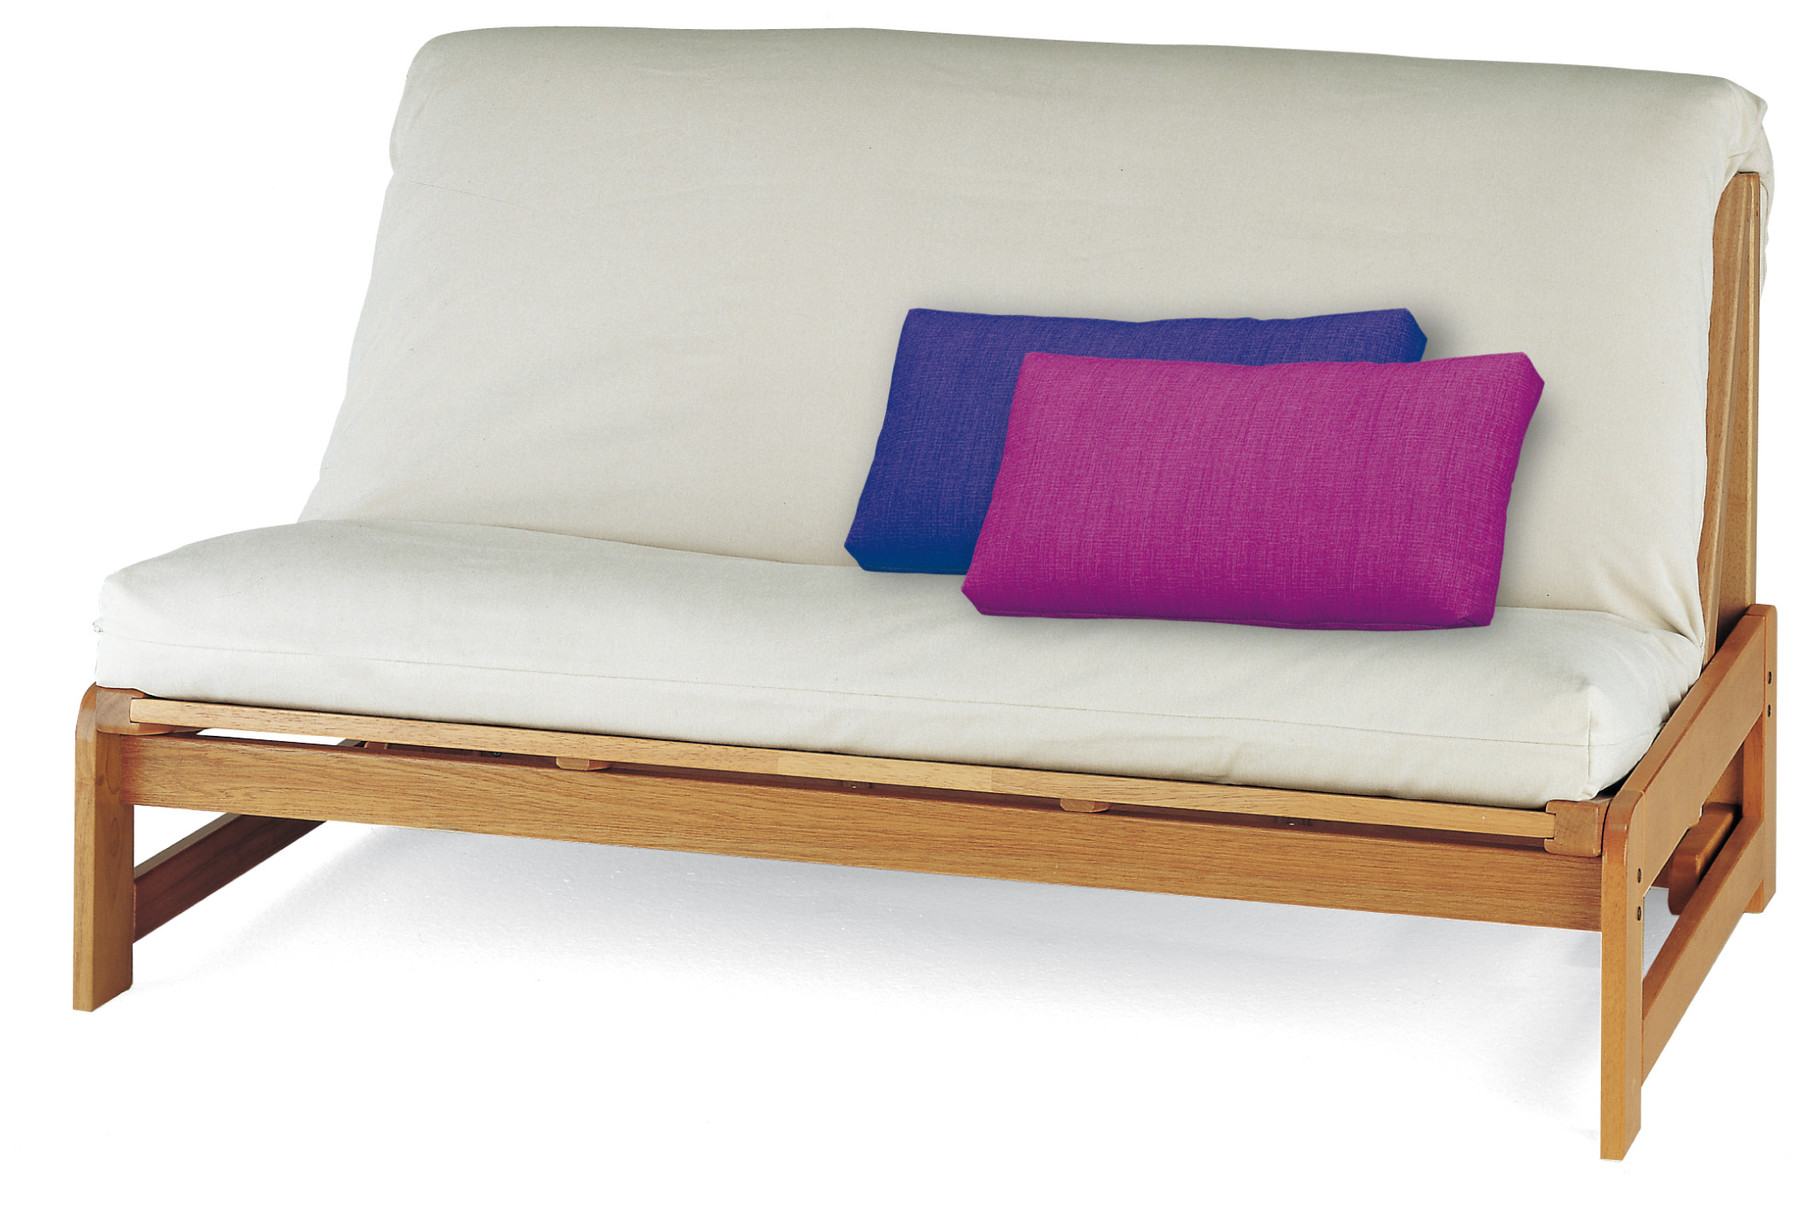 Sof s cama futon line - Sofas cama en madrid ...